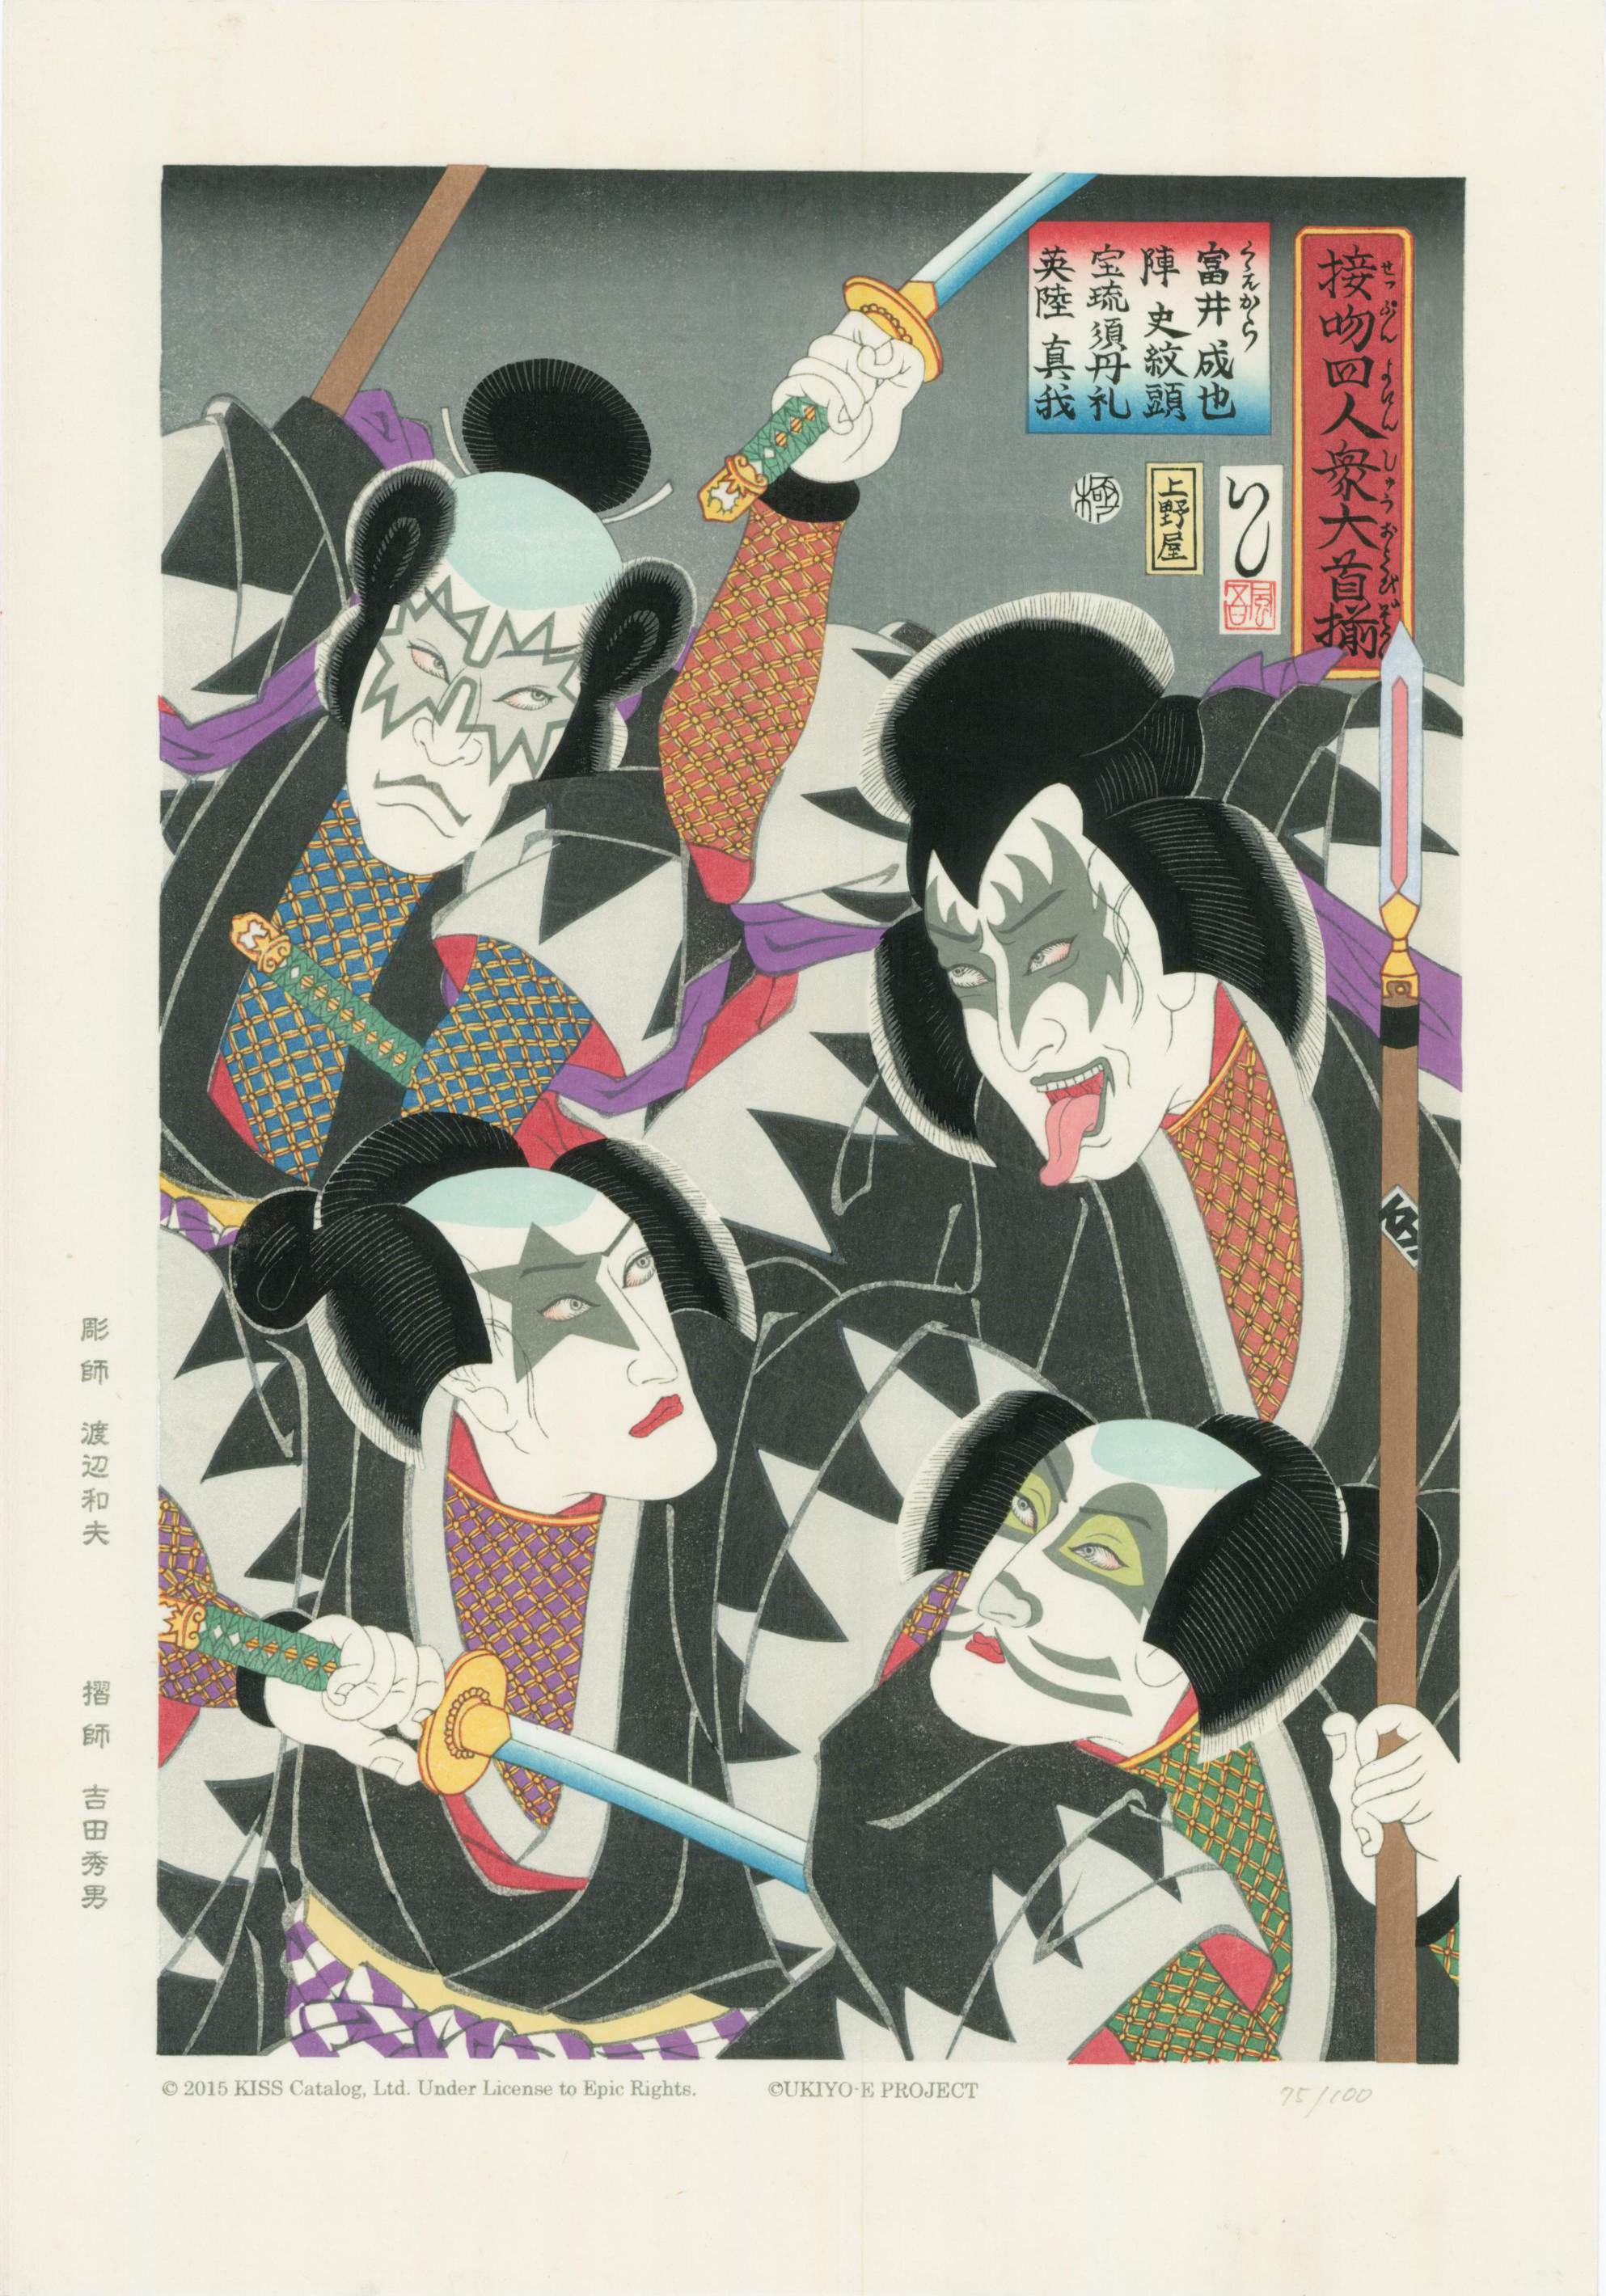 NekoPOP-KISS-Ukiyo-e-Kabuki-1